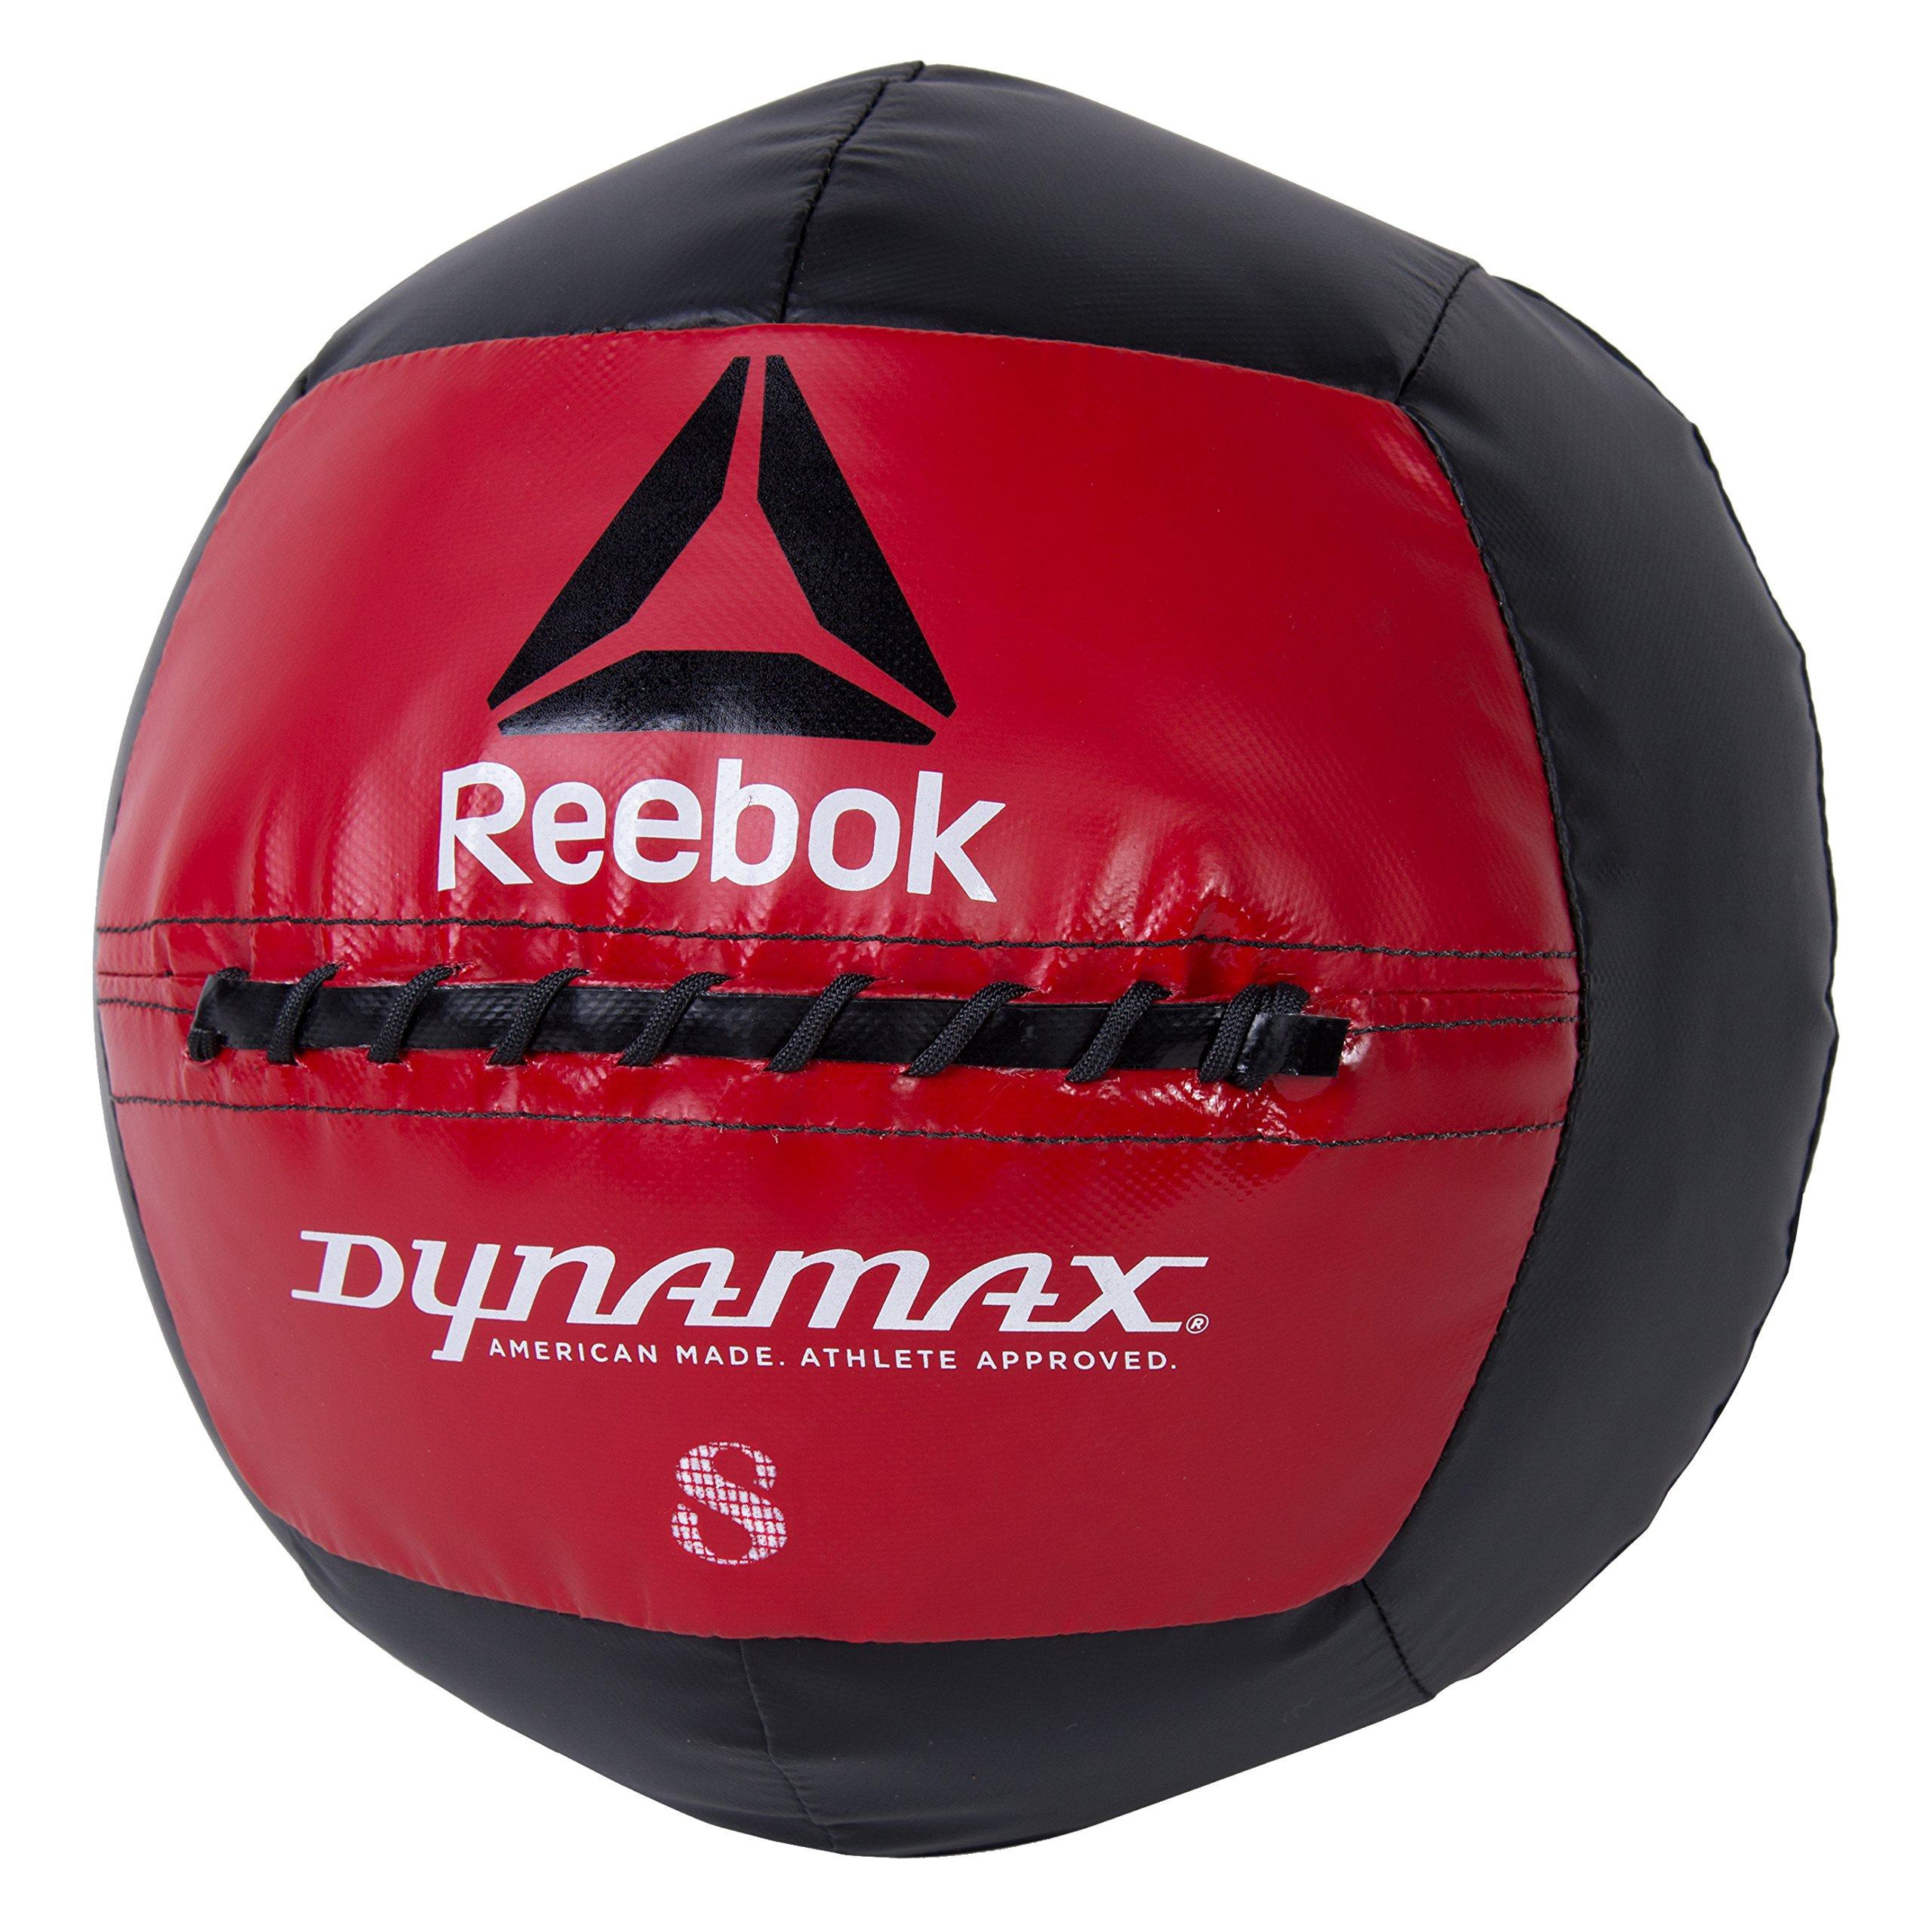 Reebok Soft-Shell Medicine Ball by Dynamax, 8 lbs